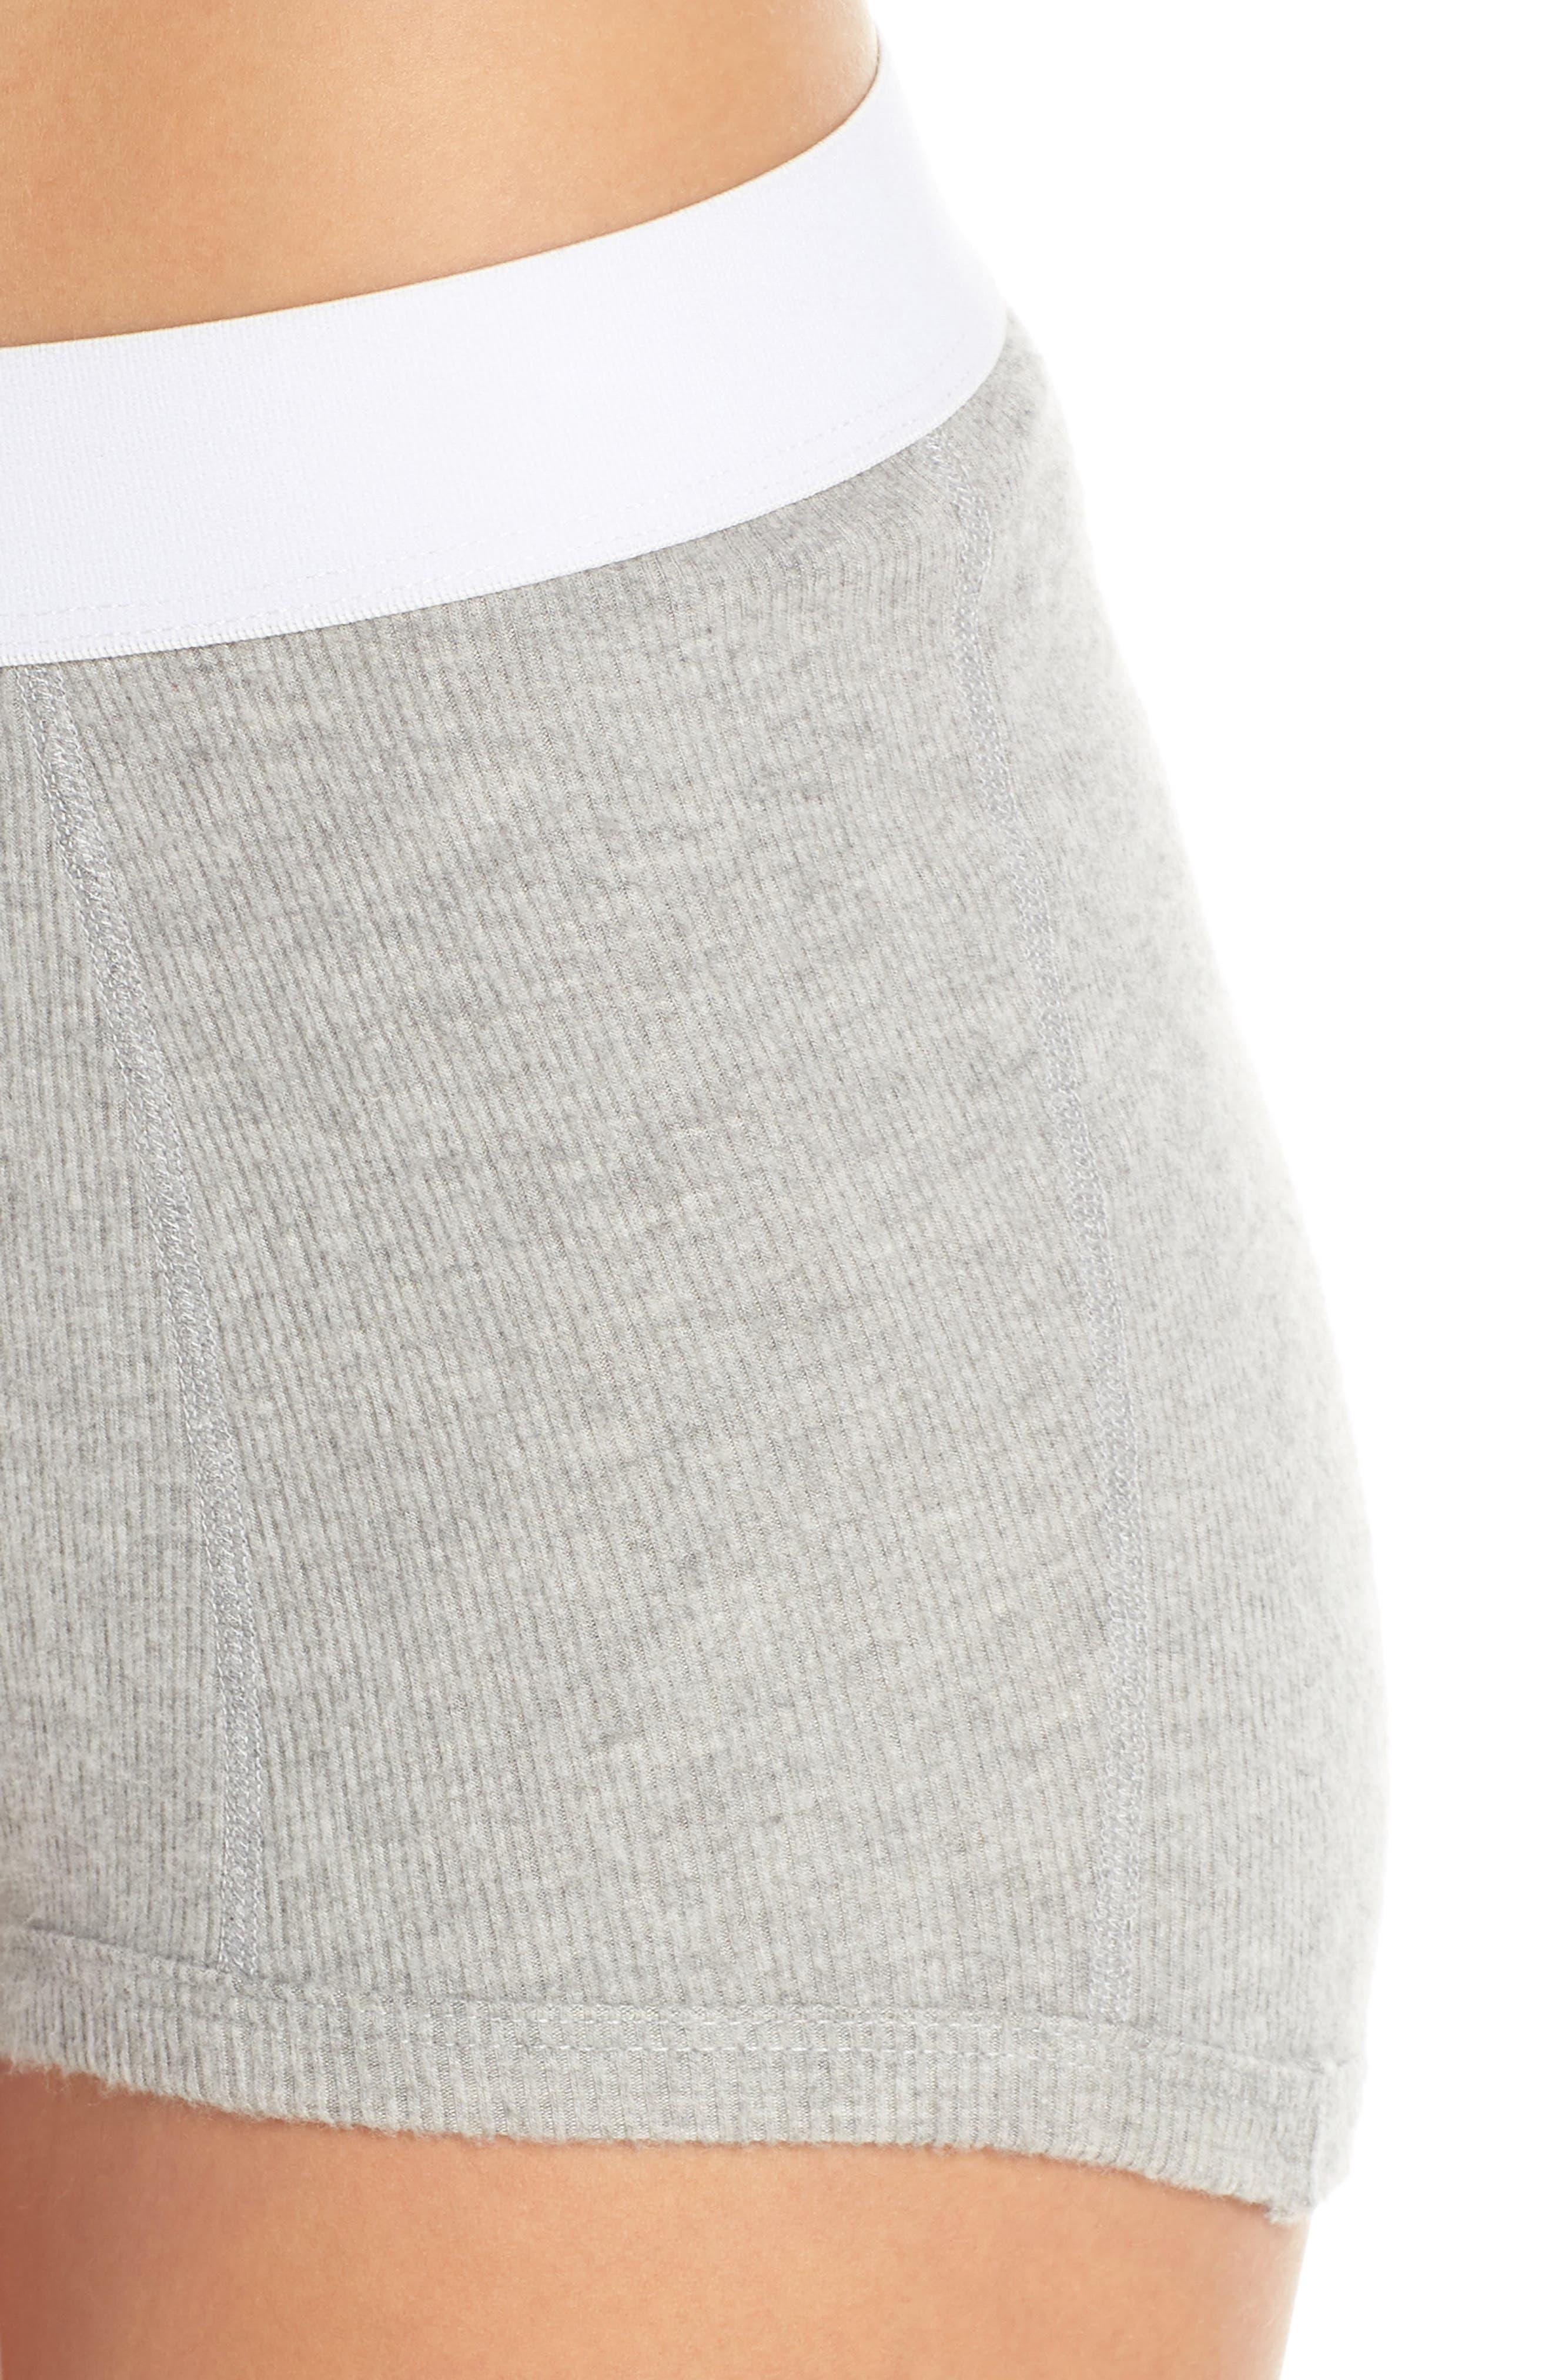 Peony Shorts,                             Alternate thumbnail 4, color,                             021